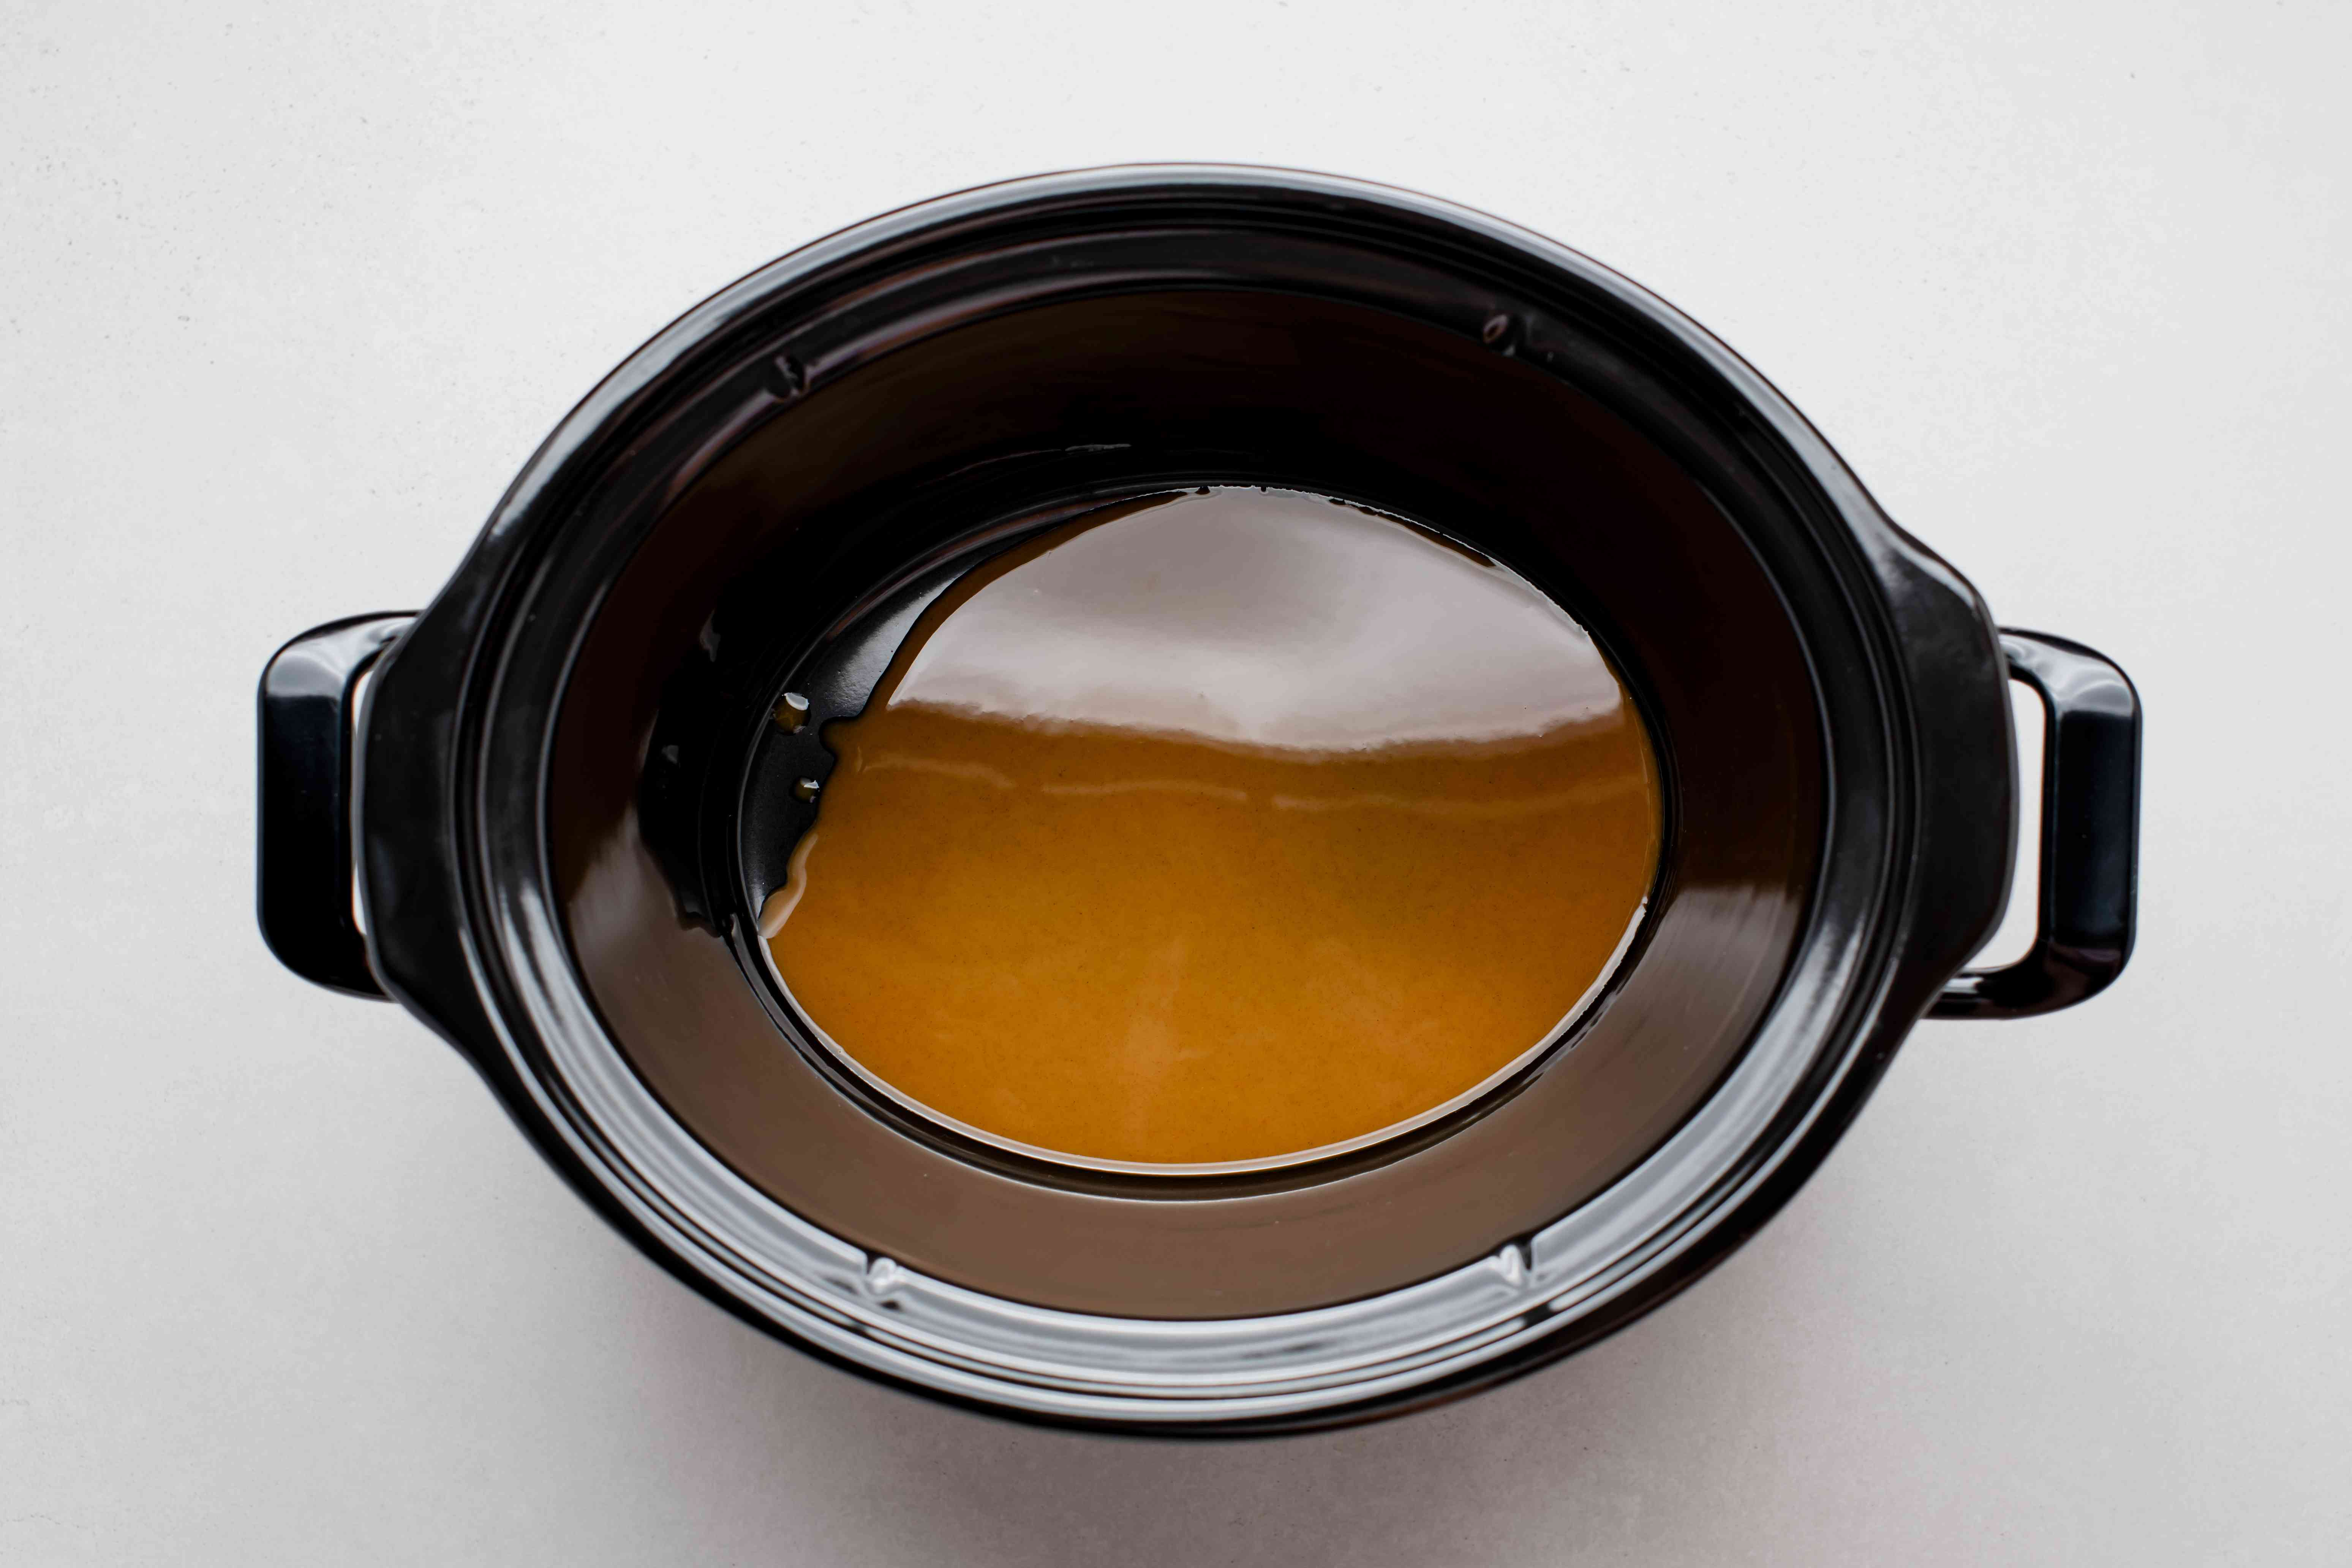 add roux to crock pot